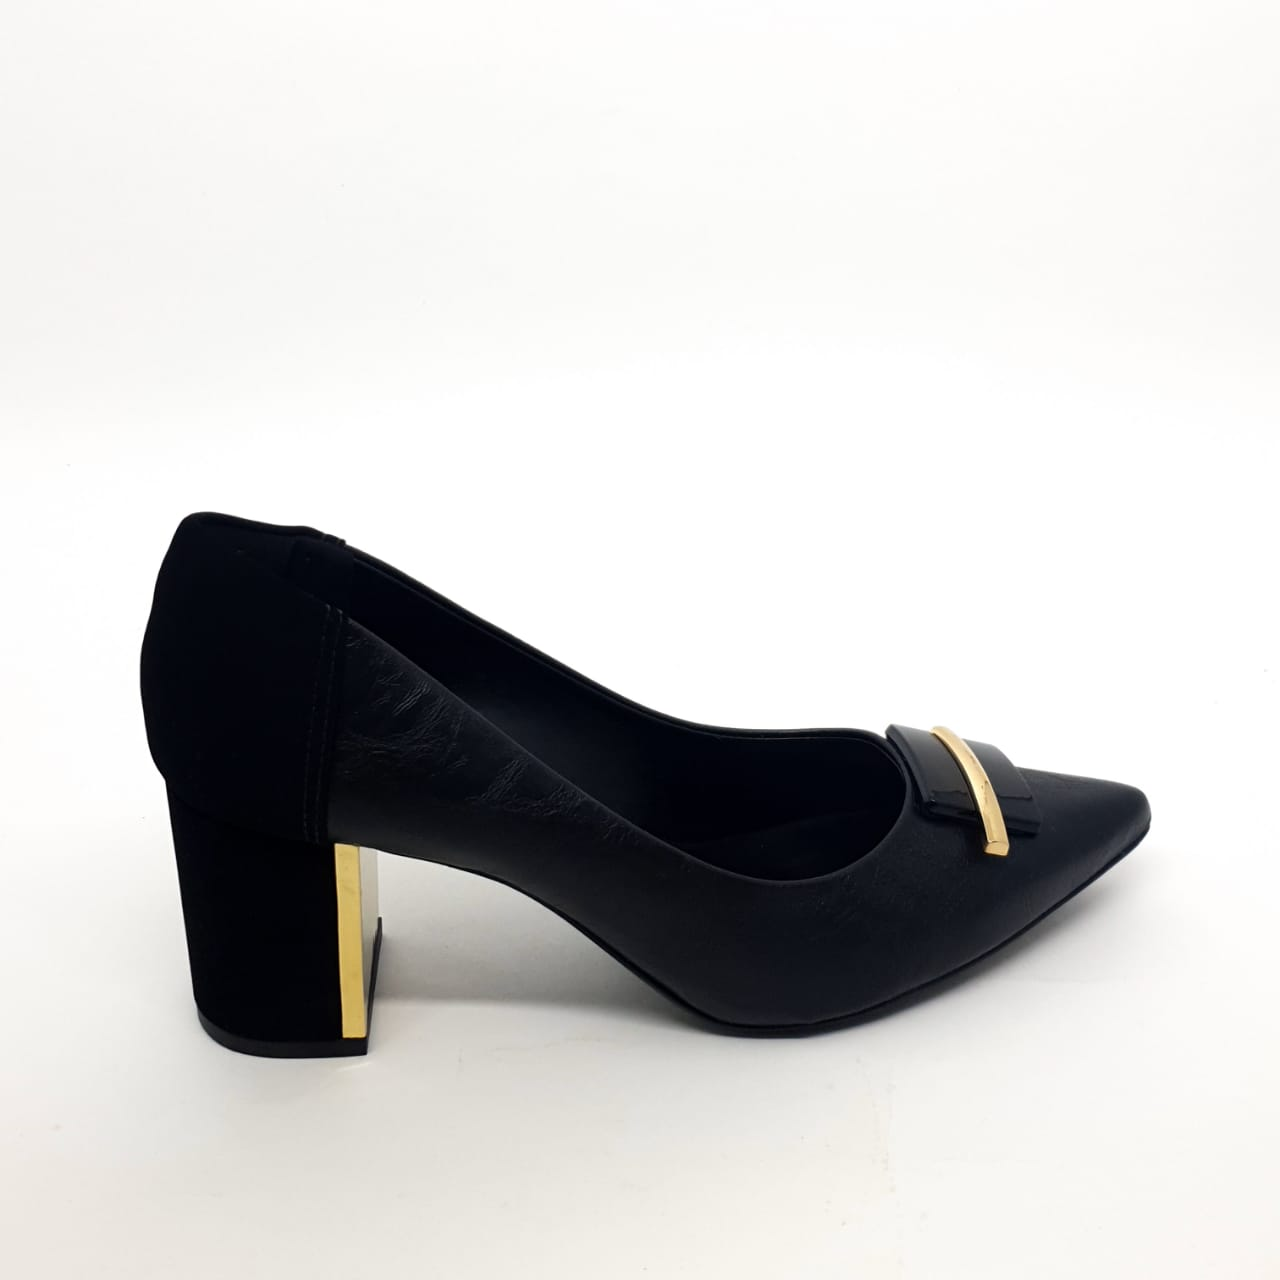 Sapato preto com fivela